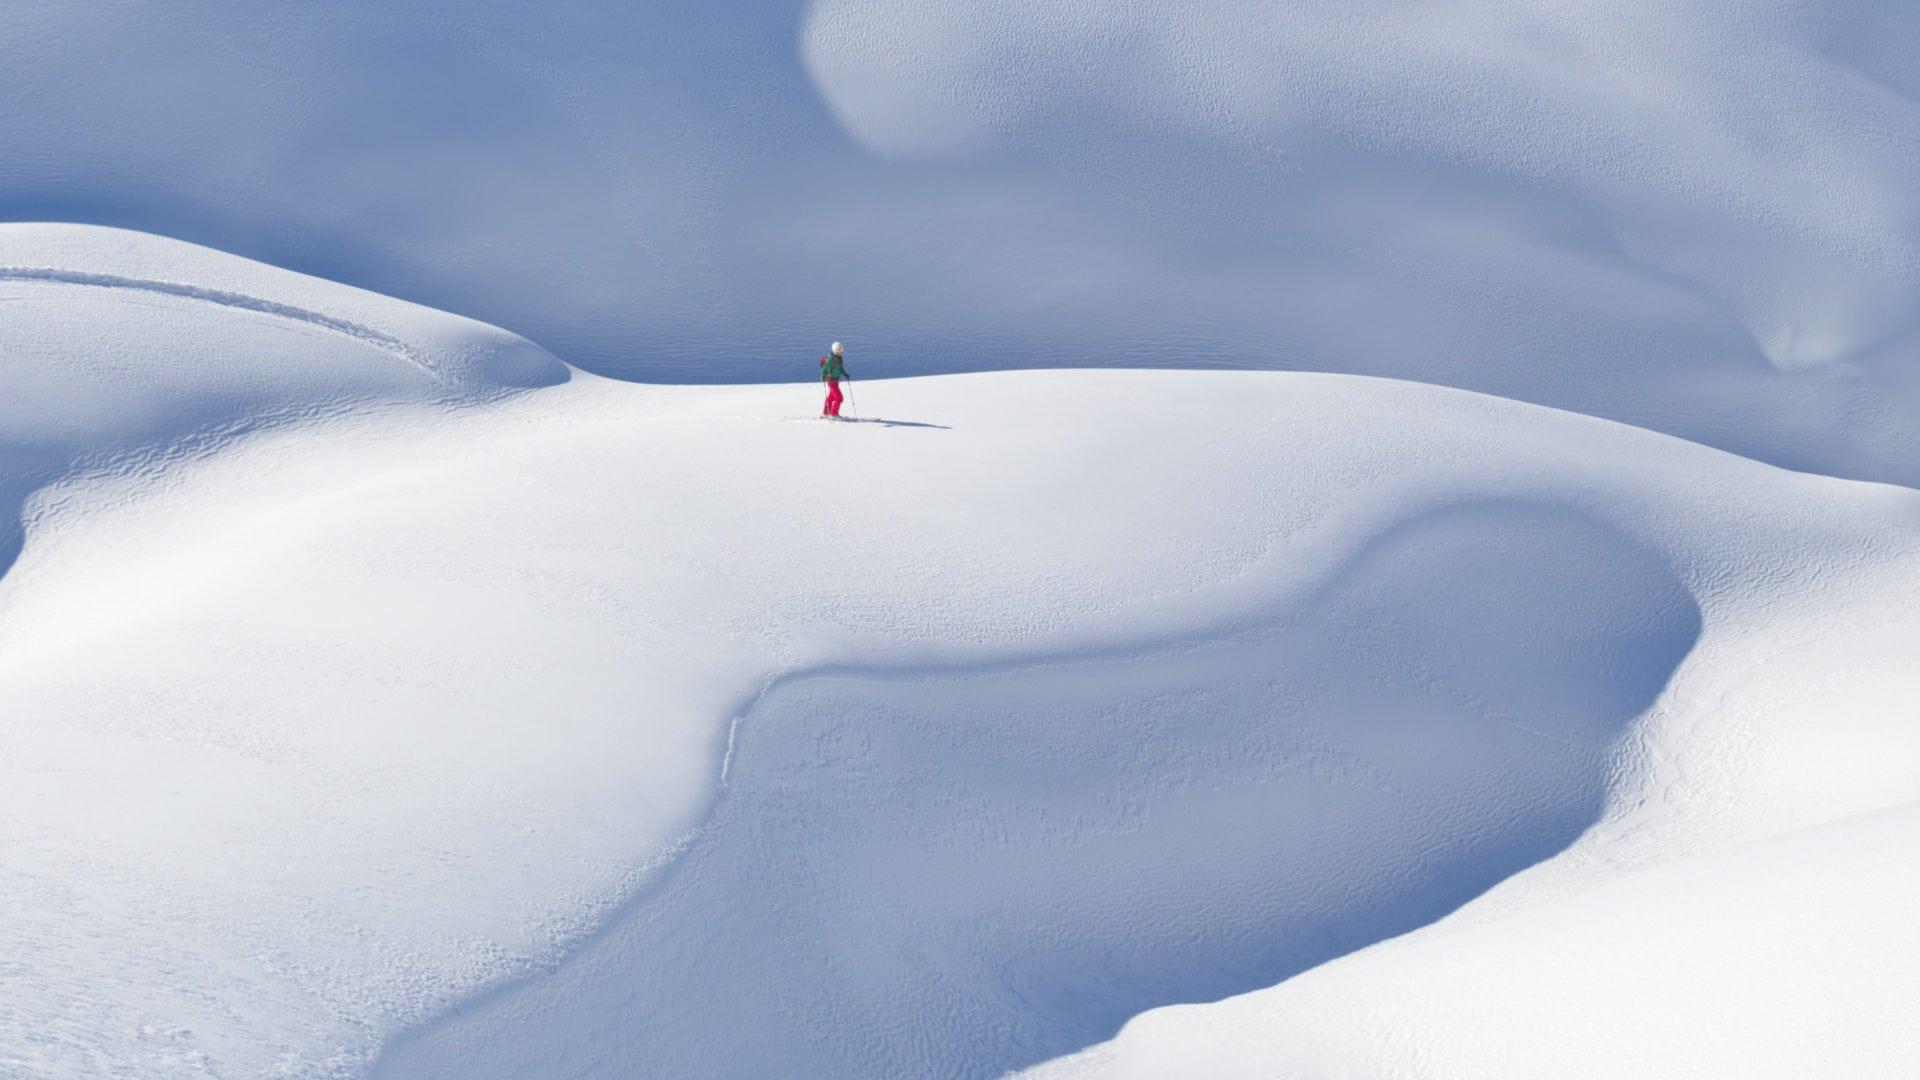 Freeride Abfahrt Gehrengrat Lech-Arlberg, Winter holidays (c) Sepp Mallaun-Vorarlberg Tourismus